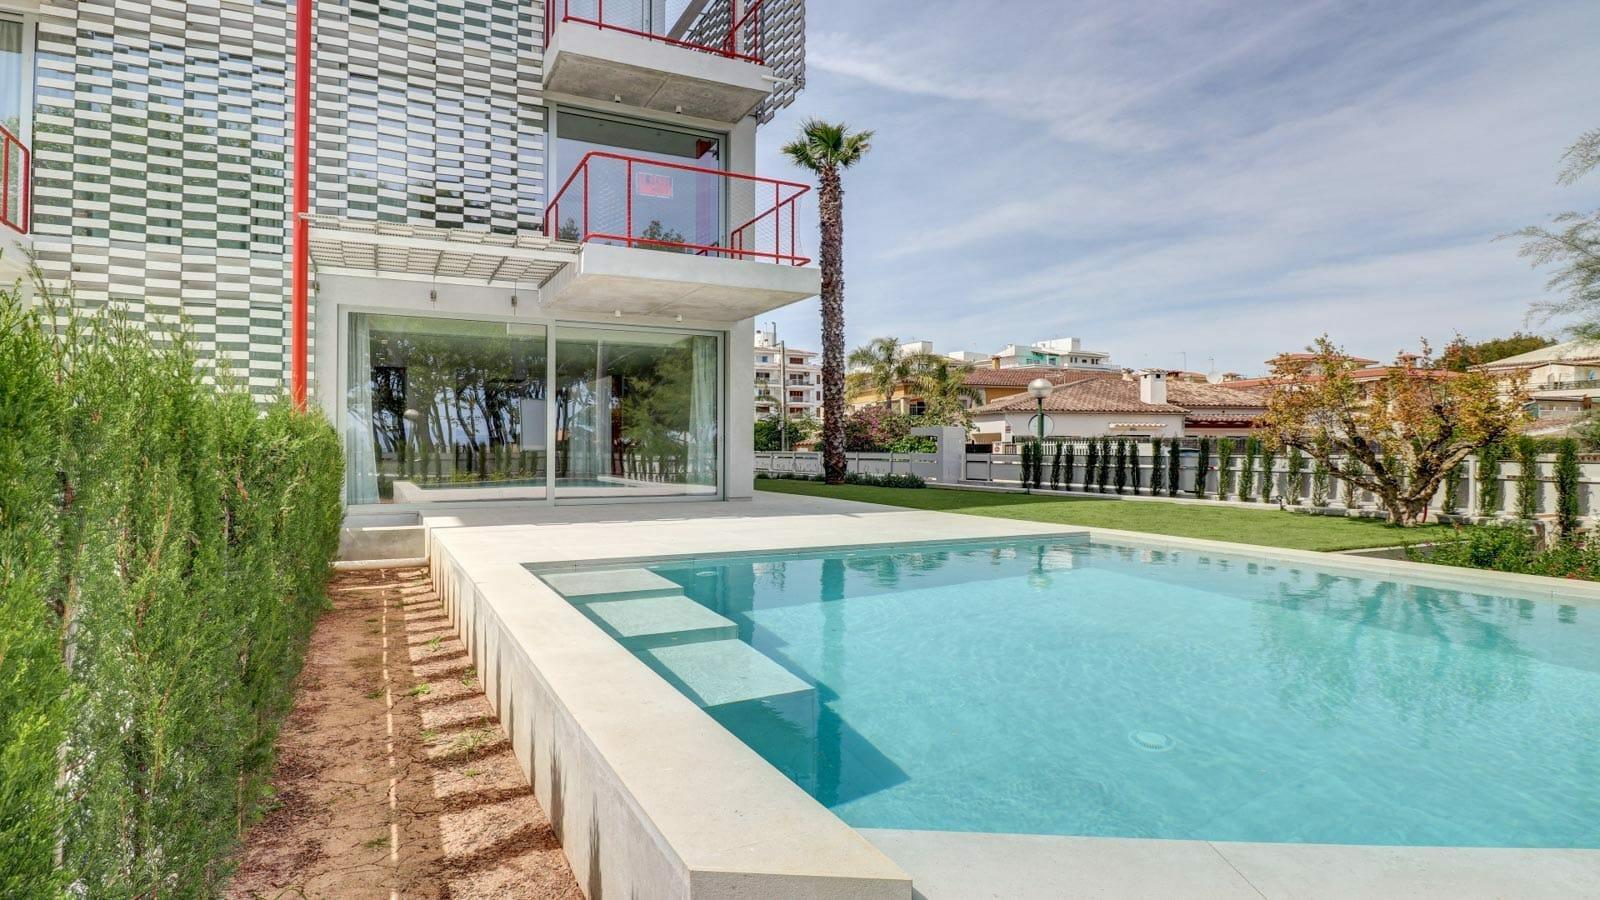 Moderne Luxus Doppelhaushälfte mit Swimmingpool in Alcudia